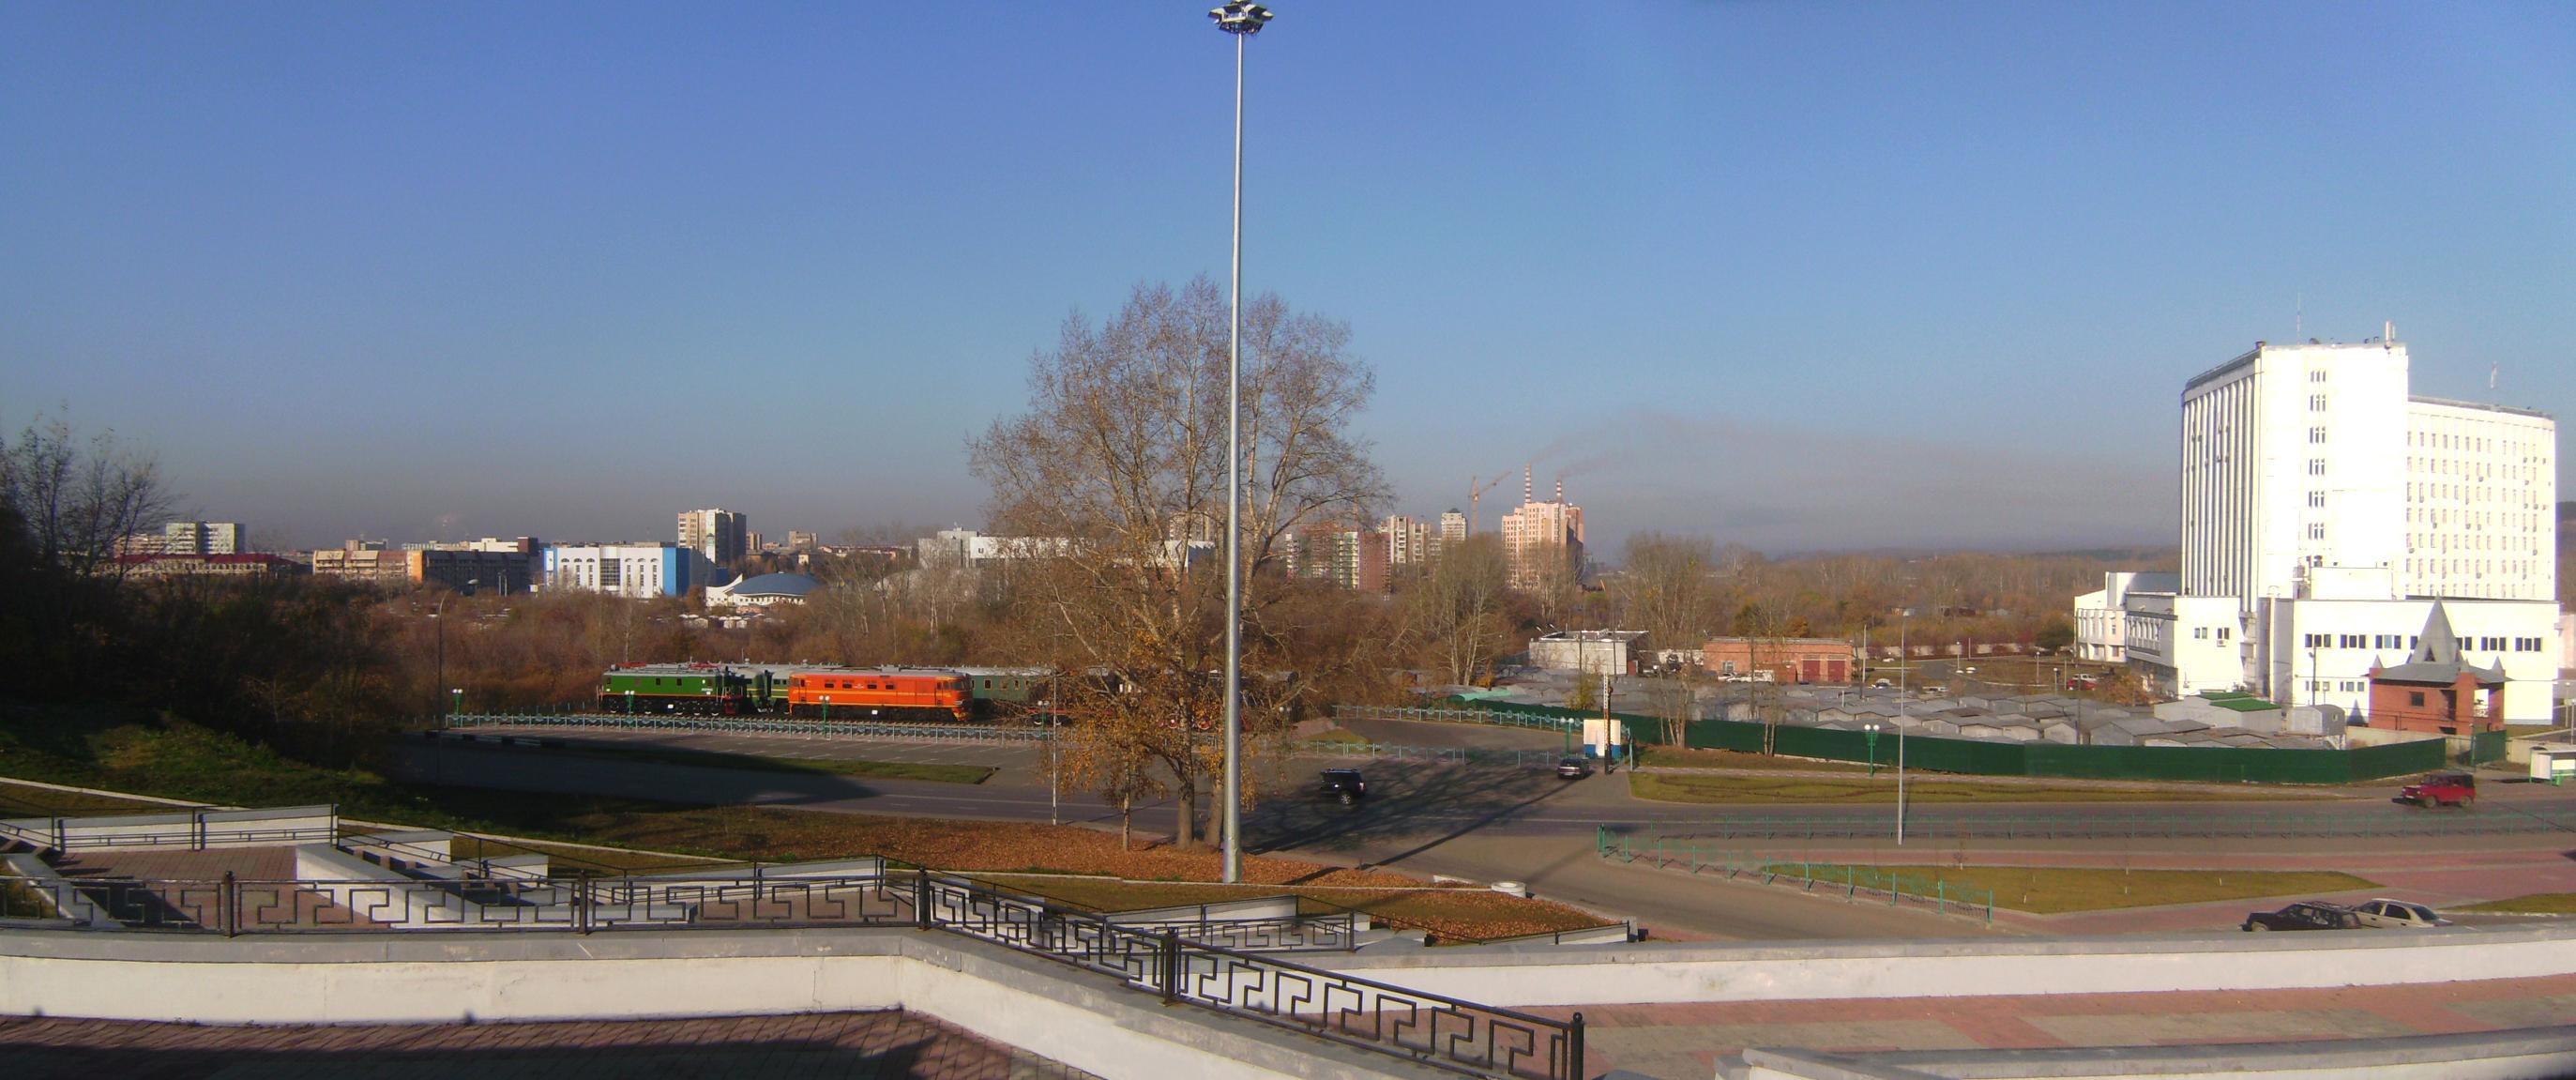 Kemerovo Pionerski-bulvar vid-na-poezda-i-gorod.jpg